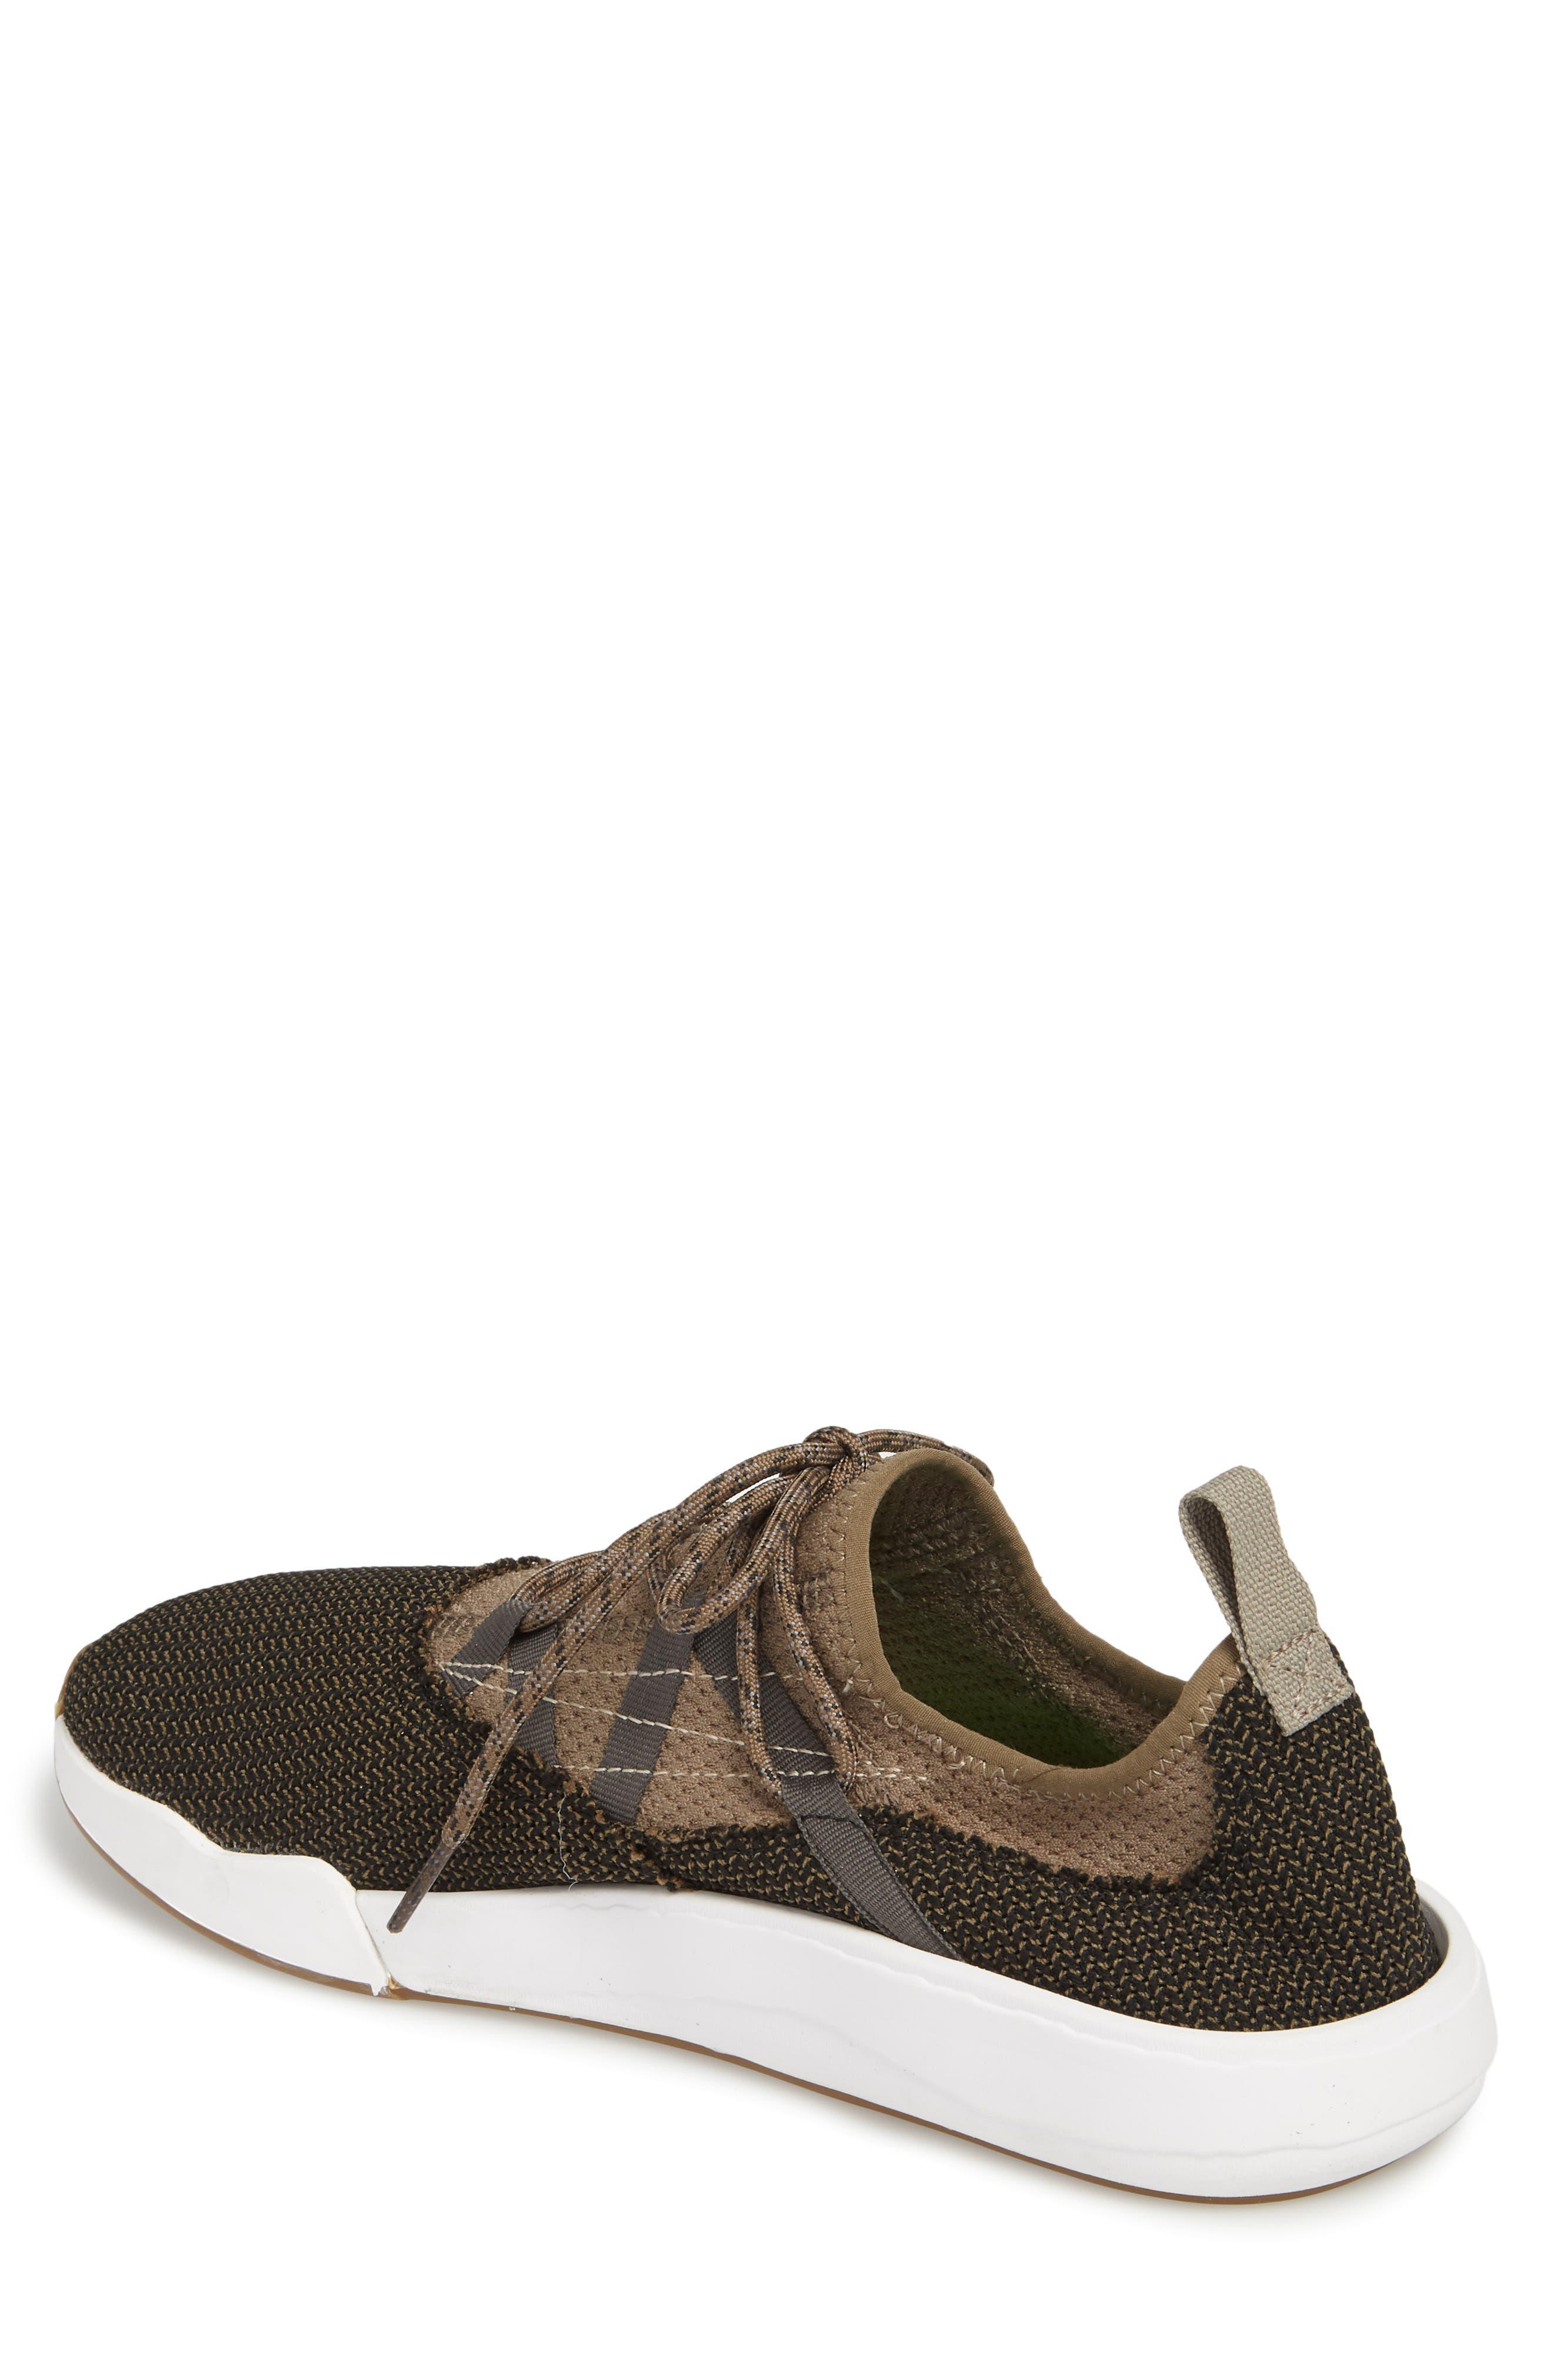 Chiba Quest Knit Sneaker,                             Alternate thumbnail 2, color,                             206